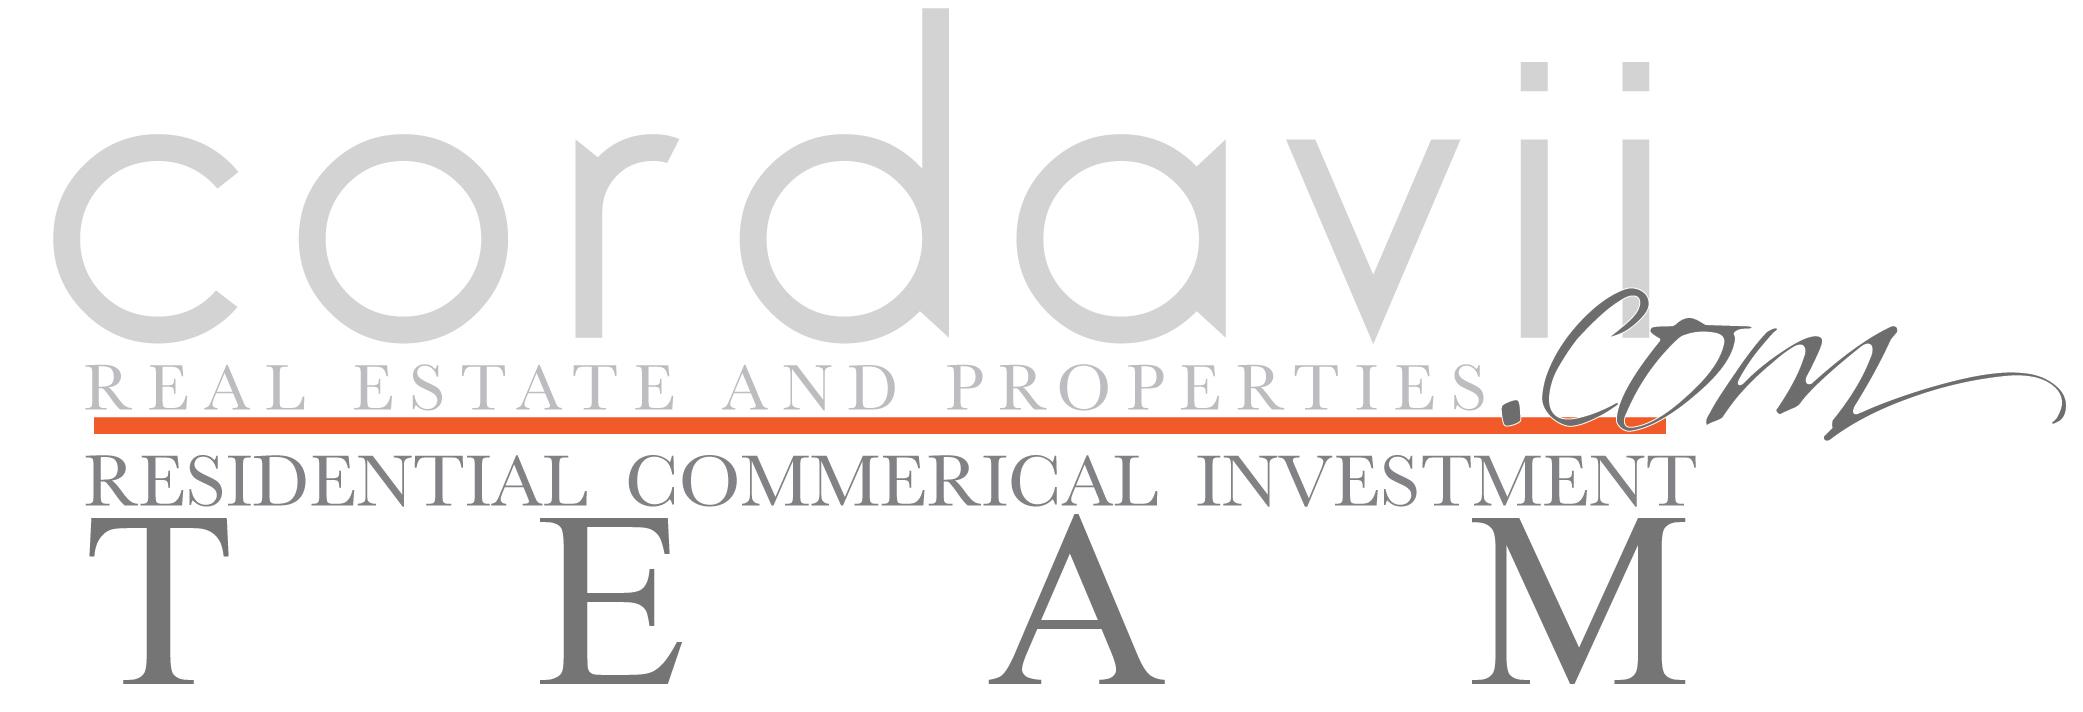 cordavii real estate and properties